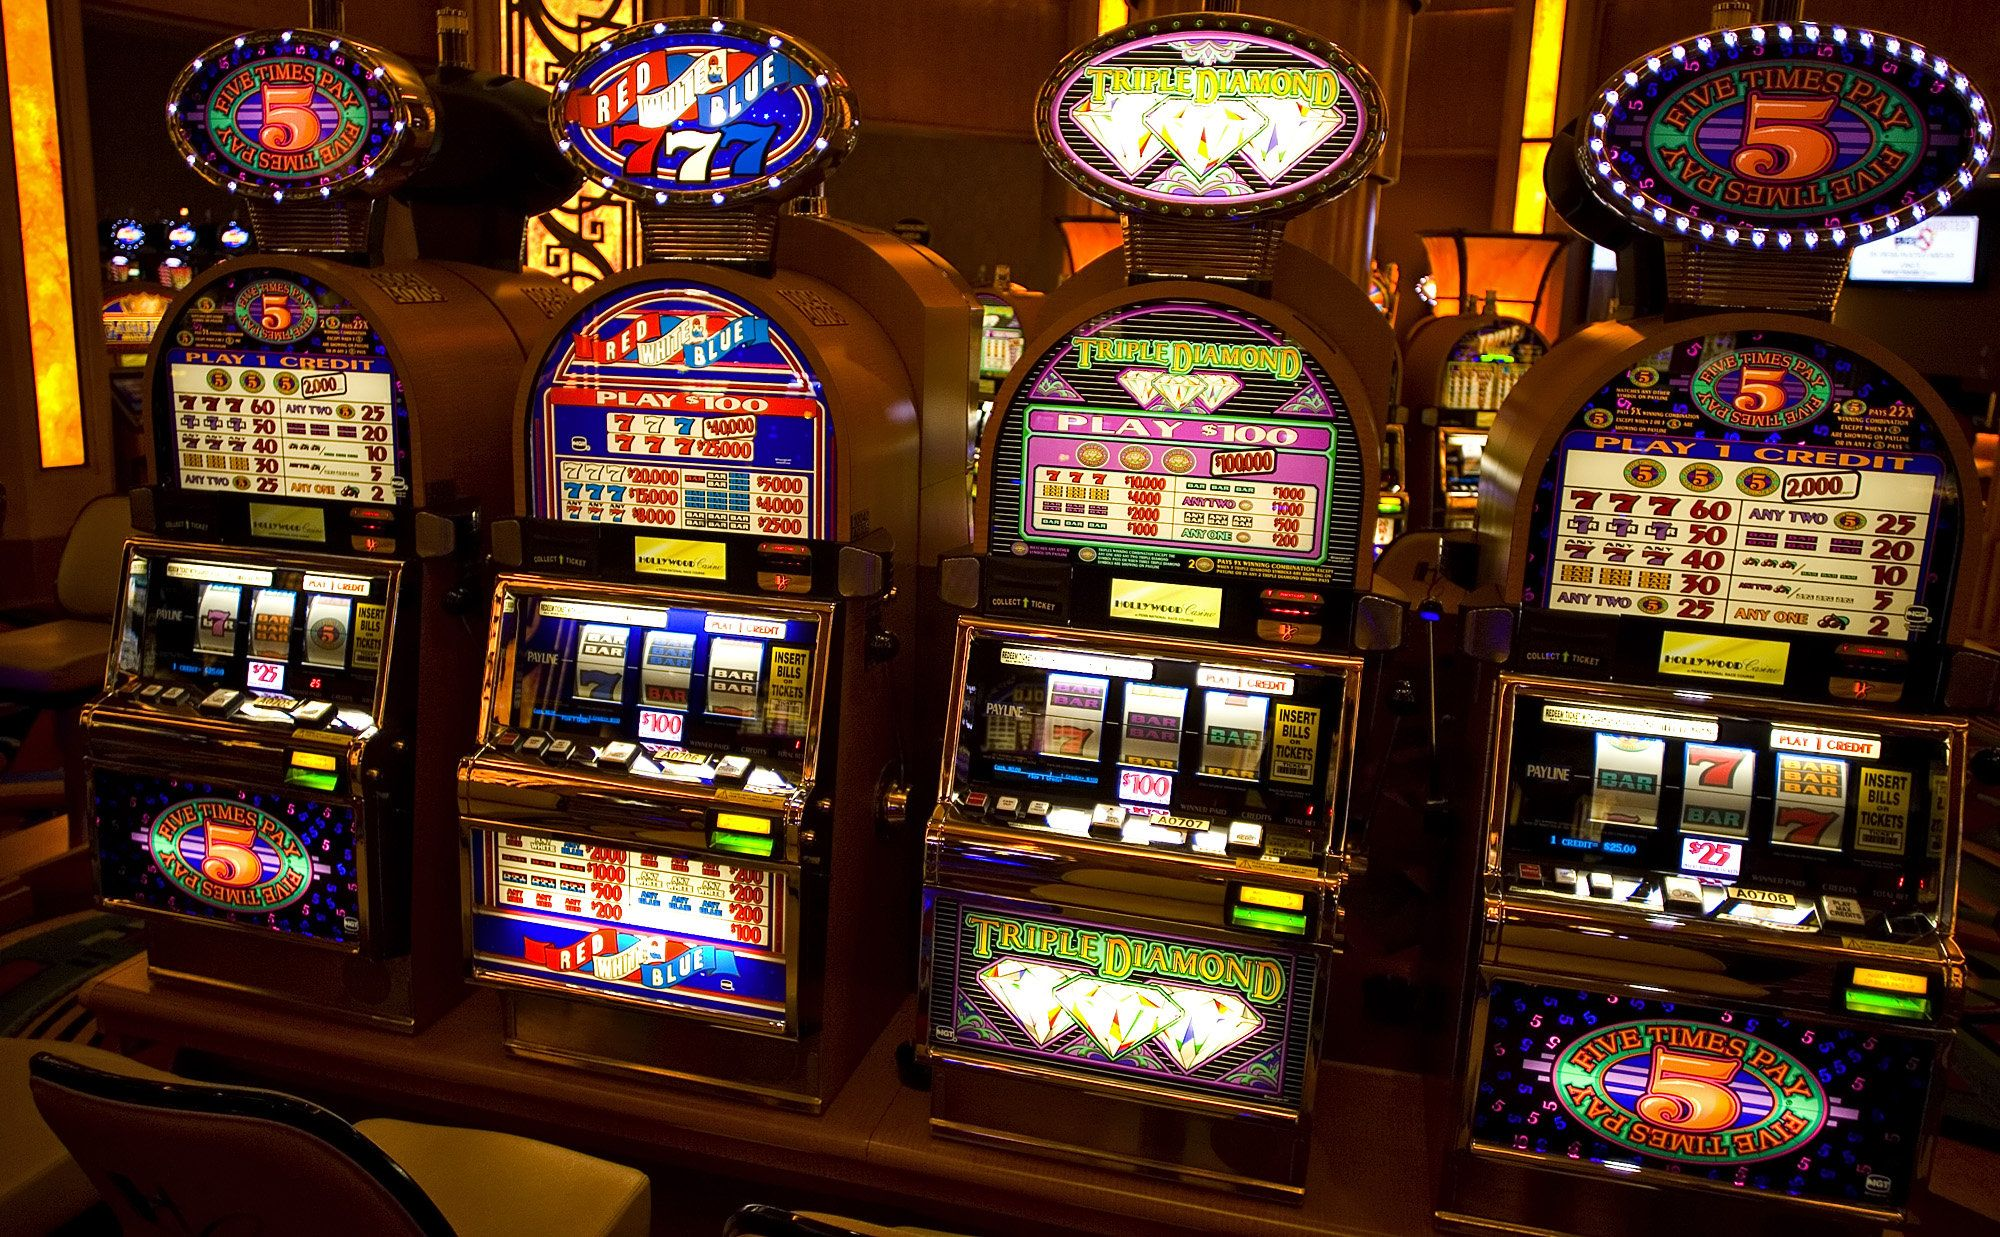 Free new slot games no download free new slot games online, free new slot games bombay, free new slot games to play, free new slot games no download, free new slot games for us players